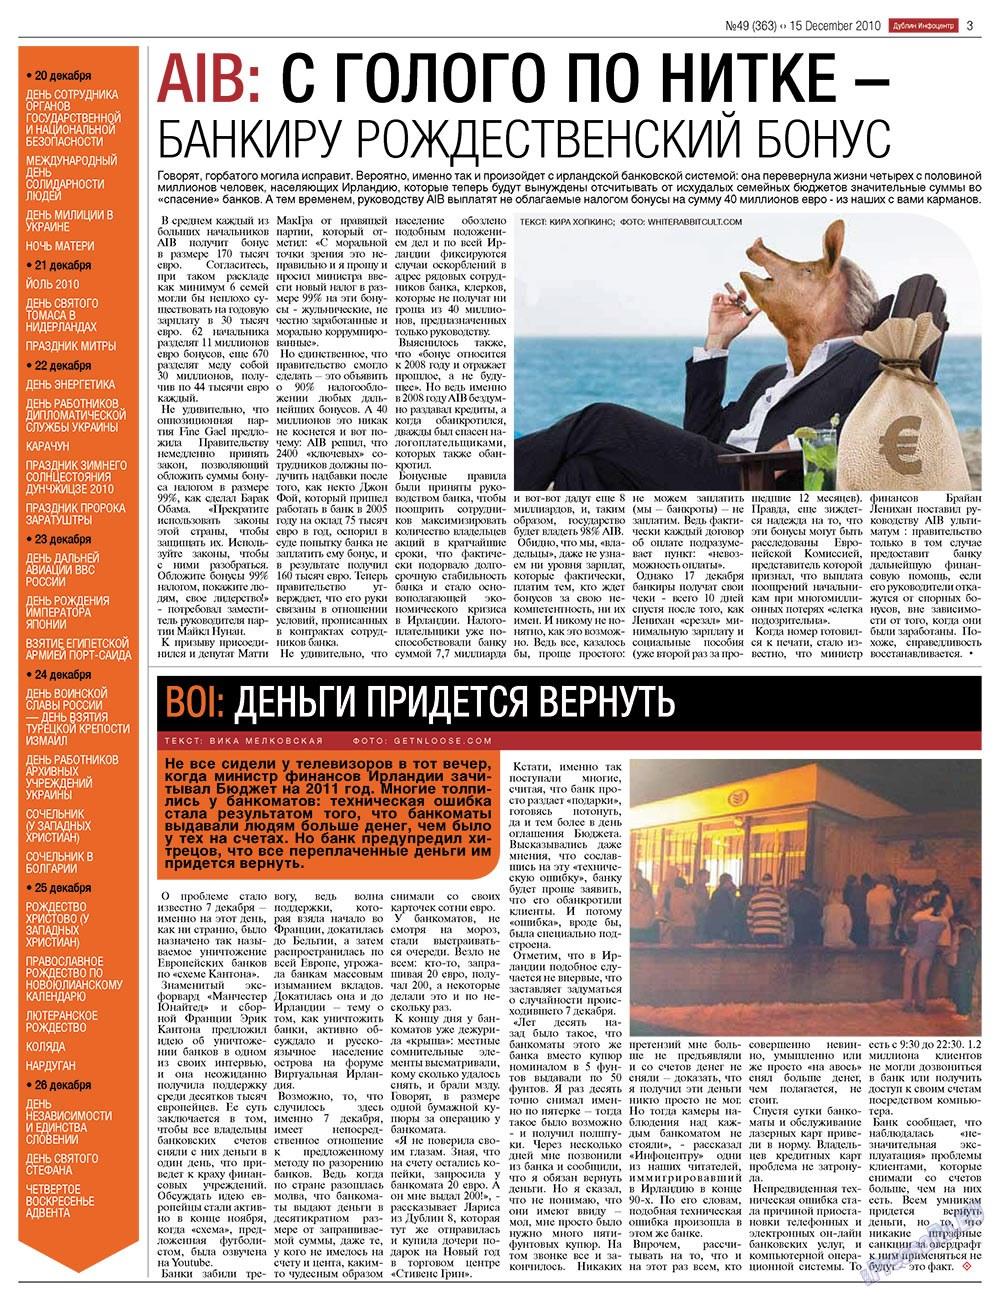 Дублин инфоцентр (газета). 2010 год, номер 49, стр. 3